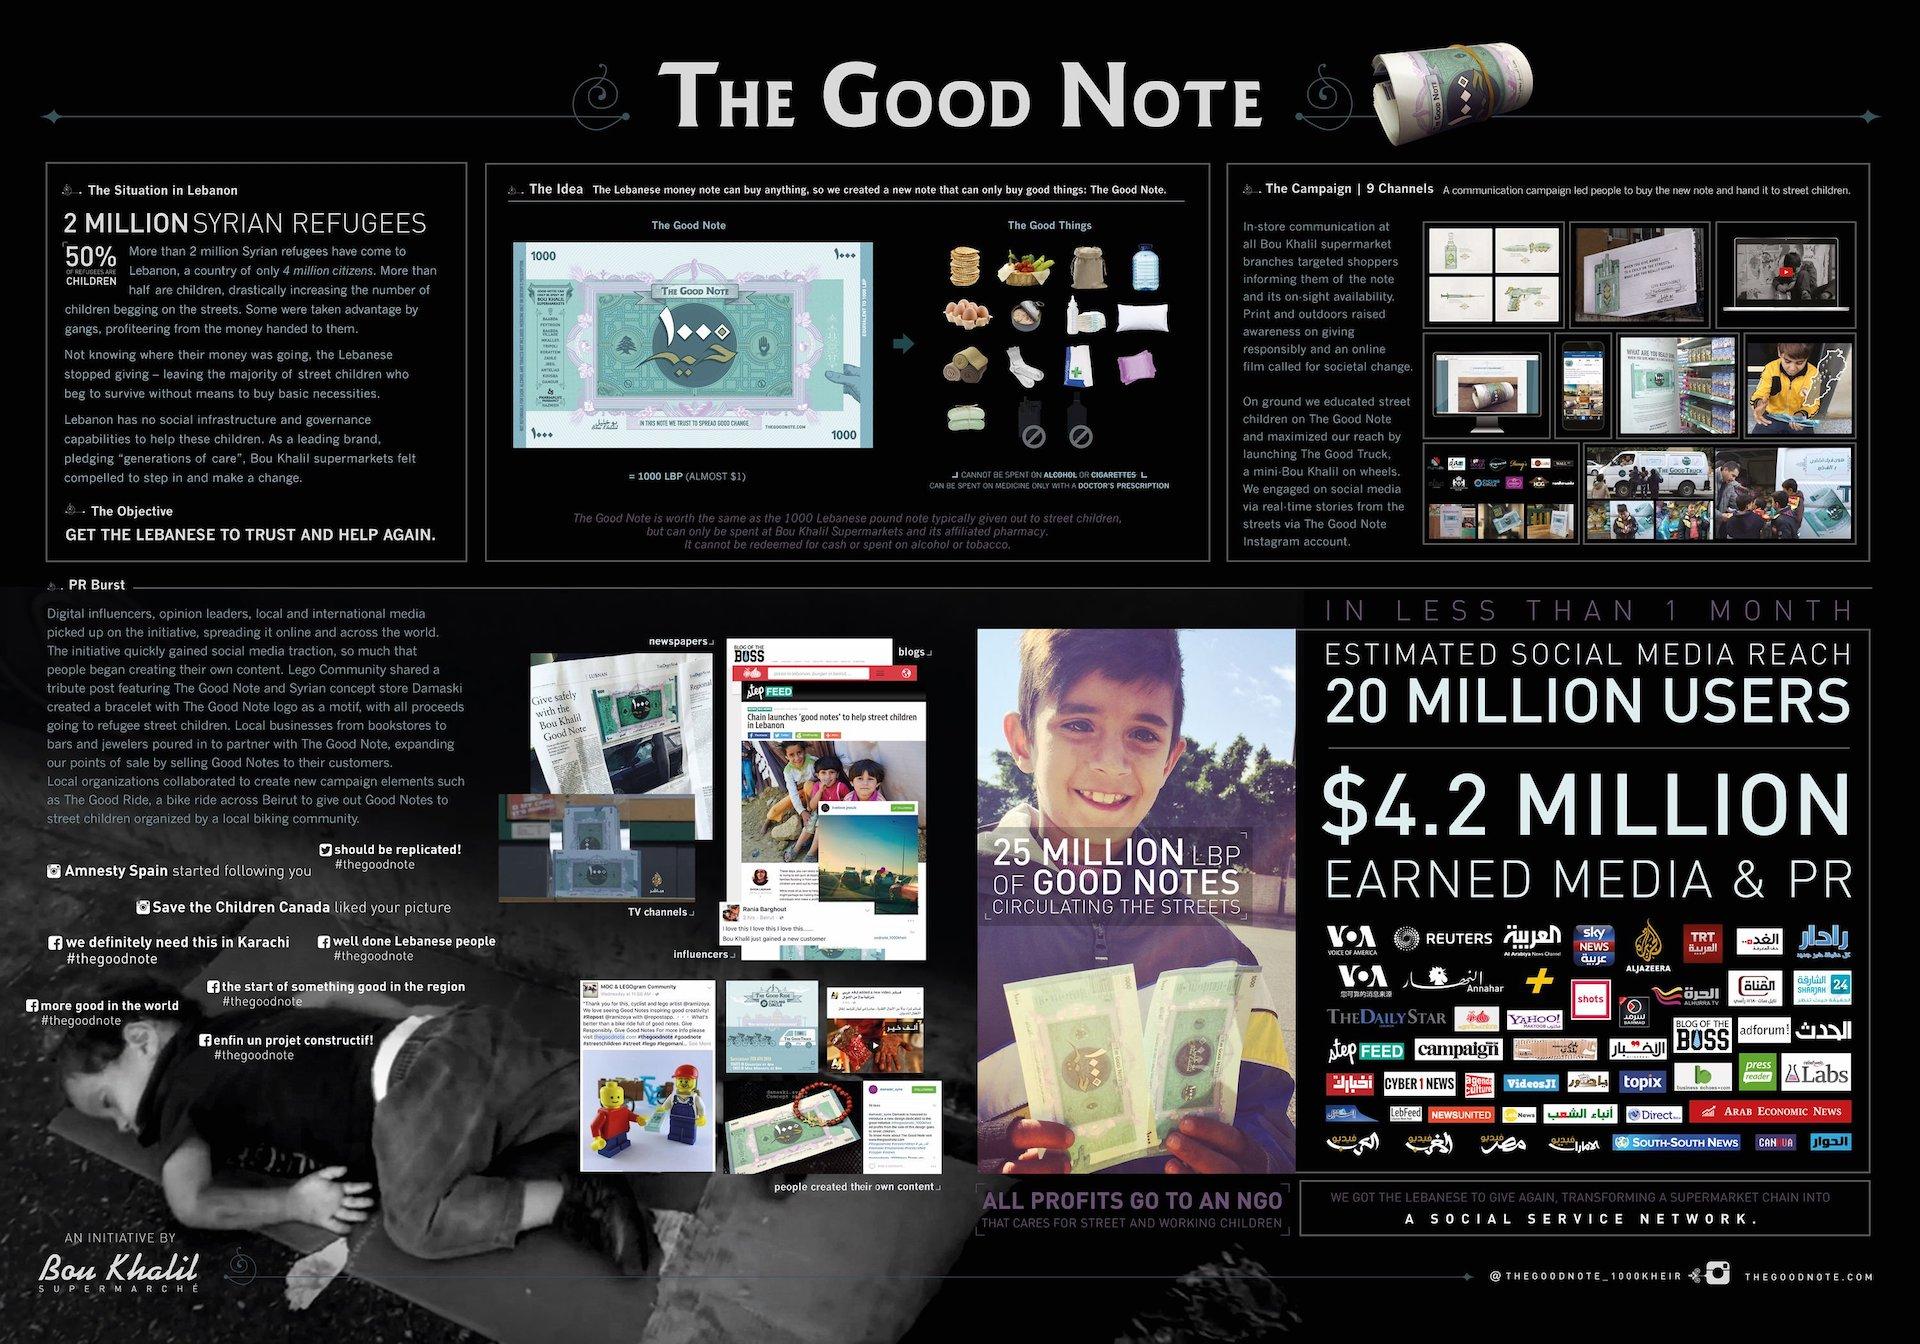 bou-khalil-the-good-note-2.jpg